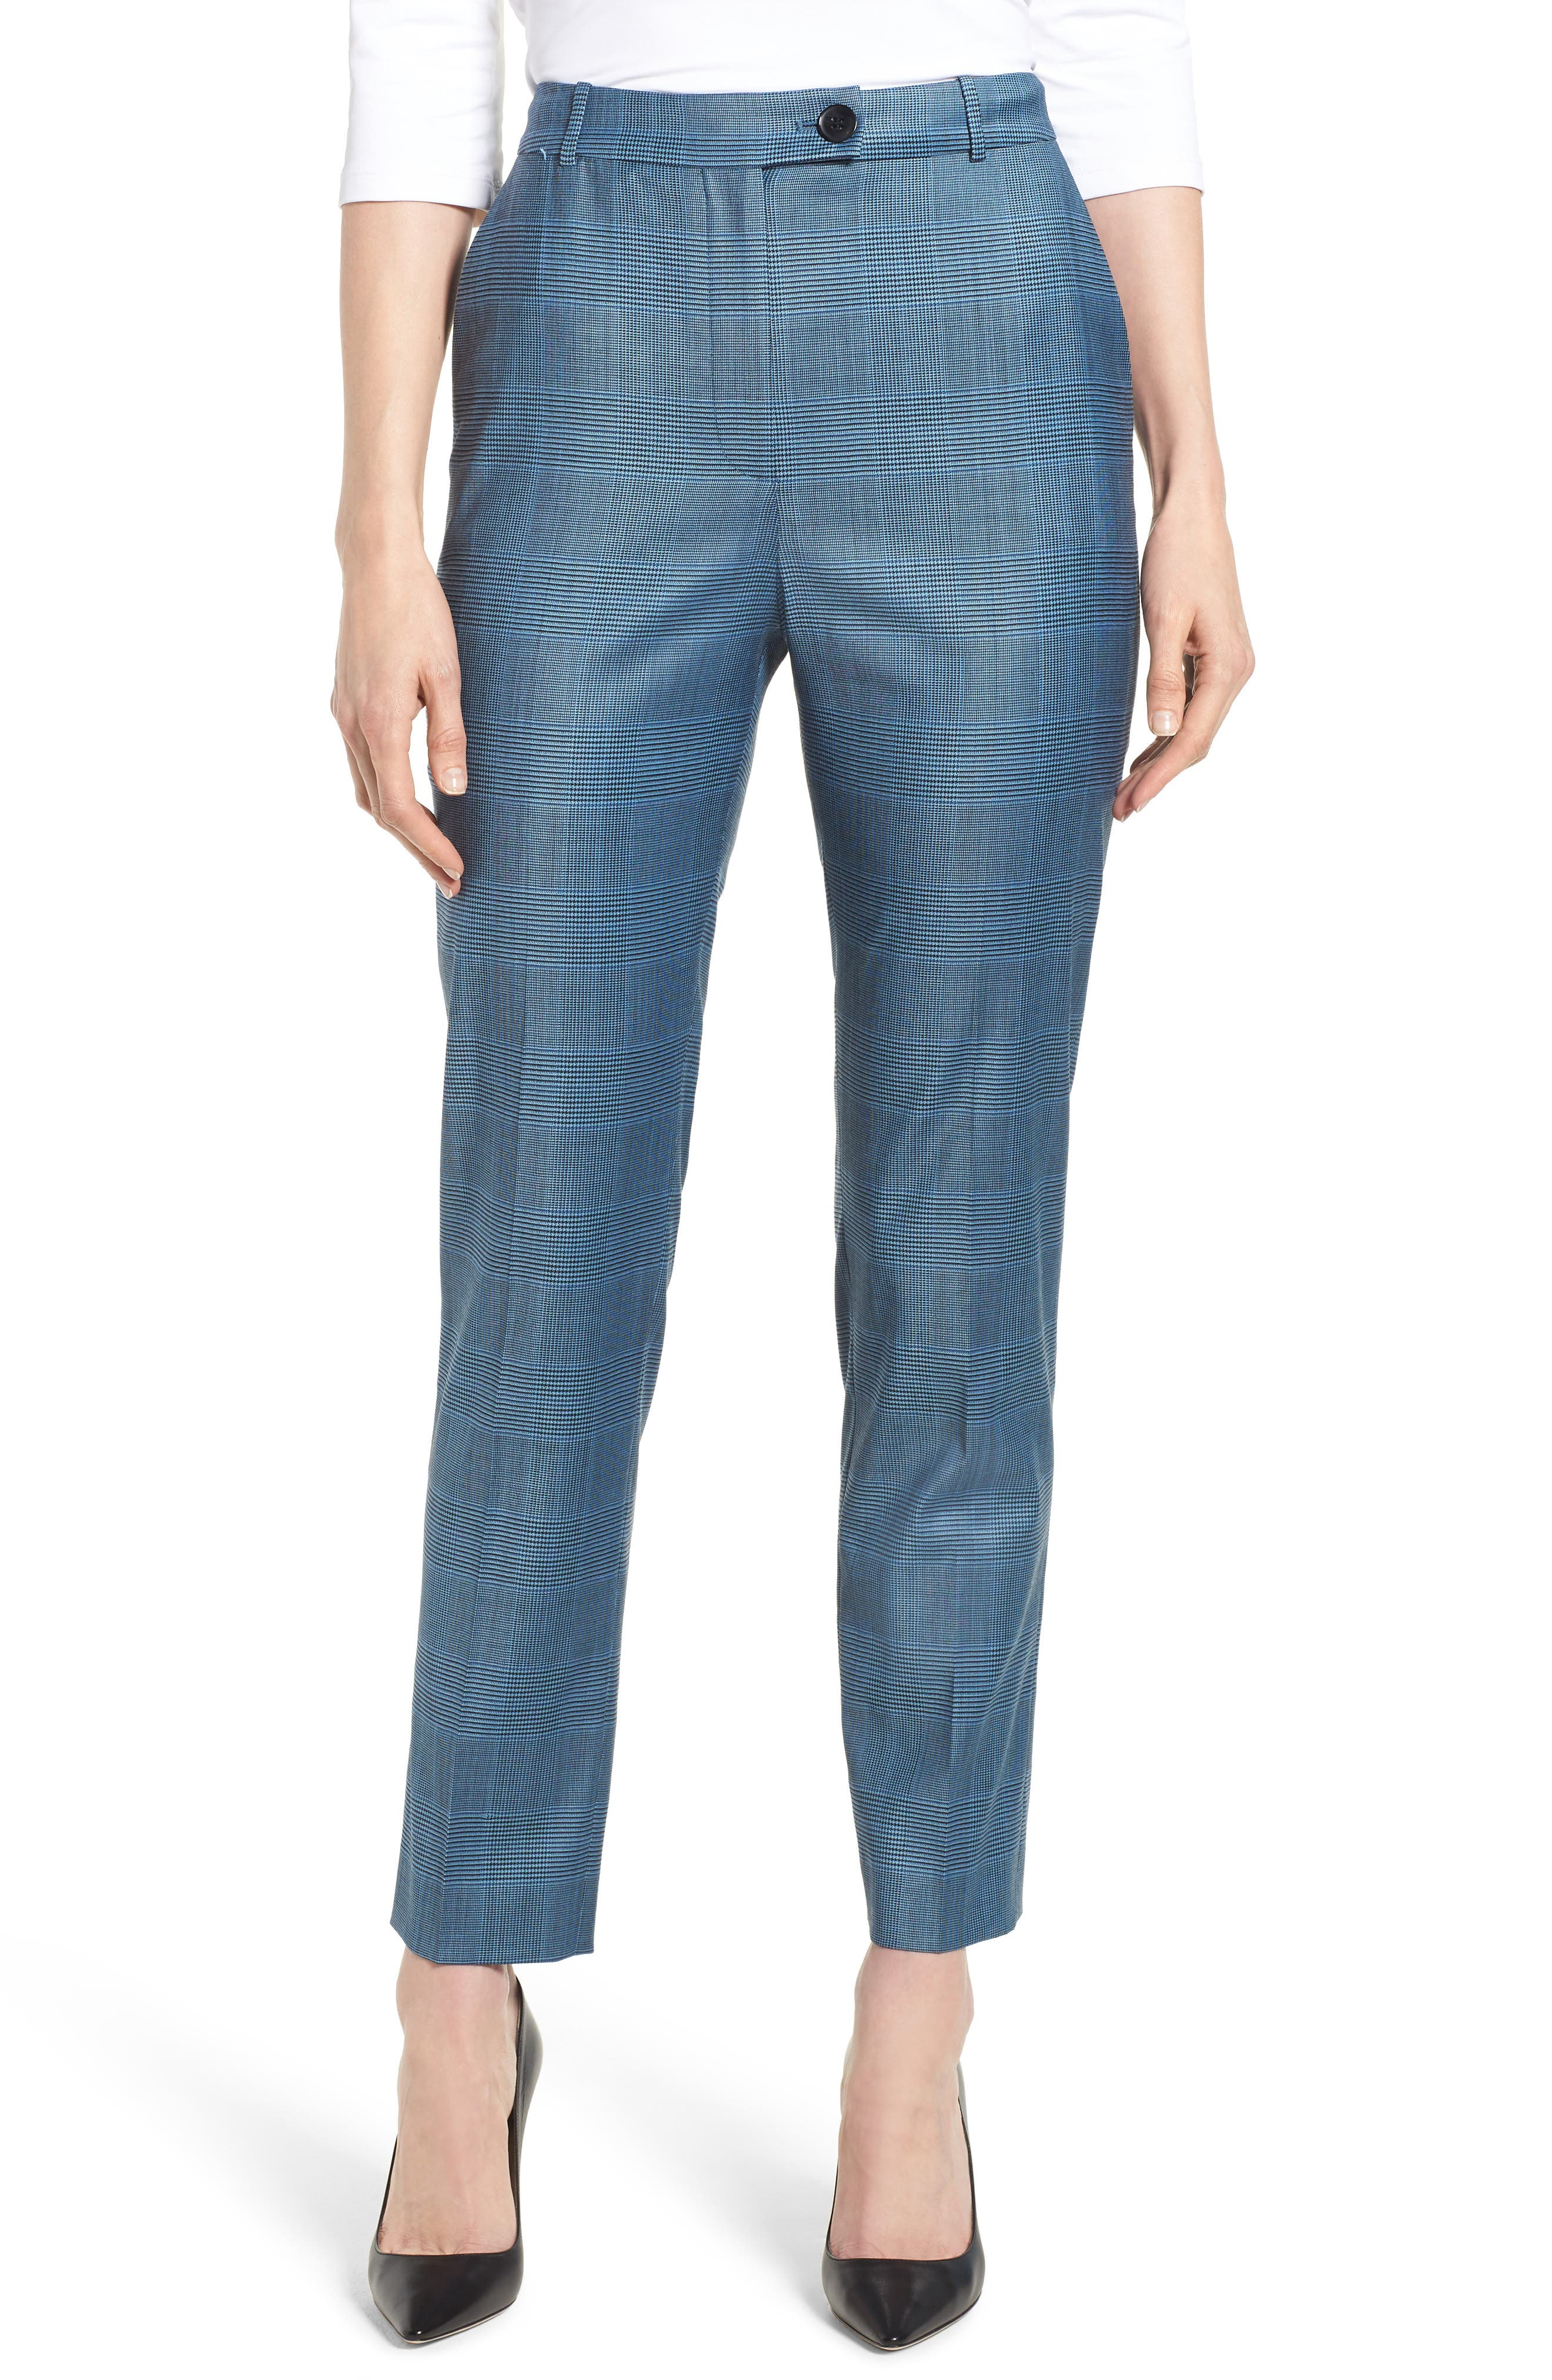 Tofilia Glencheck Slim Fit Trousers,                             Main thumbnail 1, color,                             Sailor Blue Fantasy